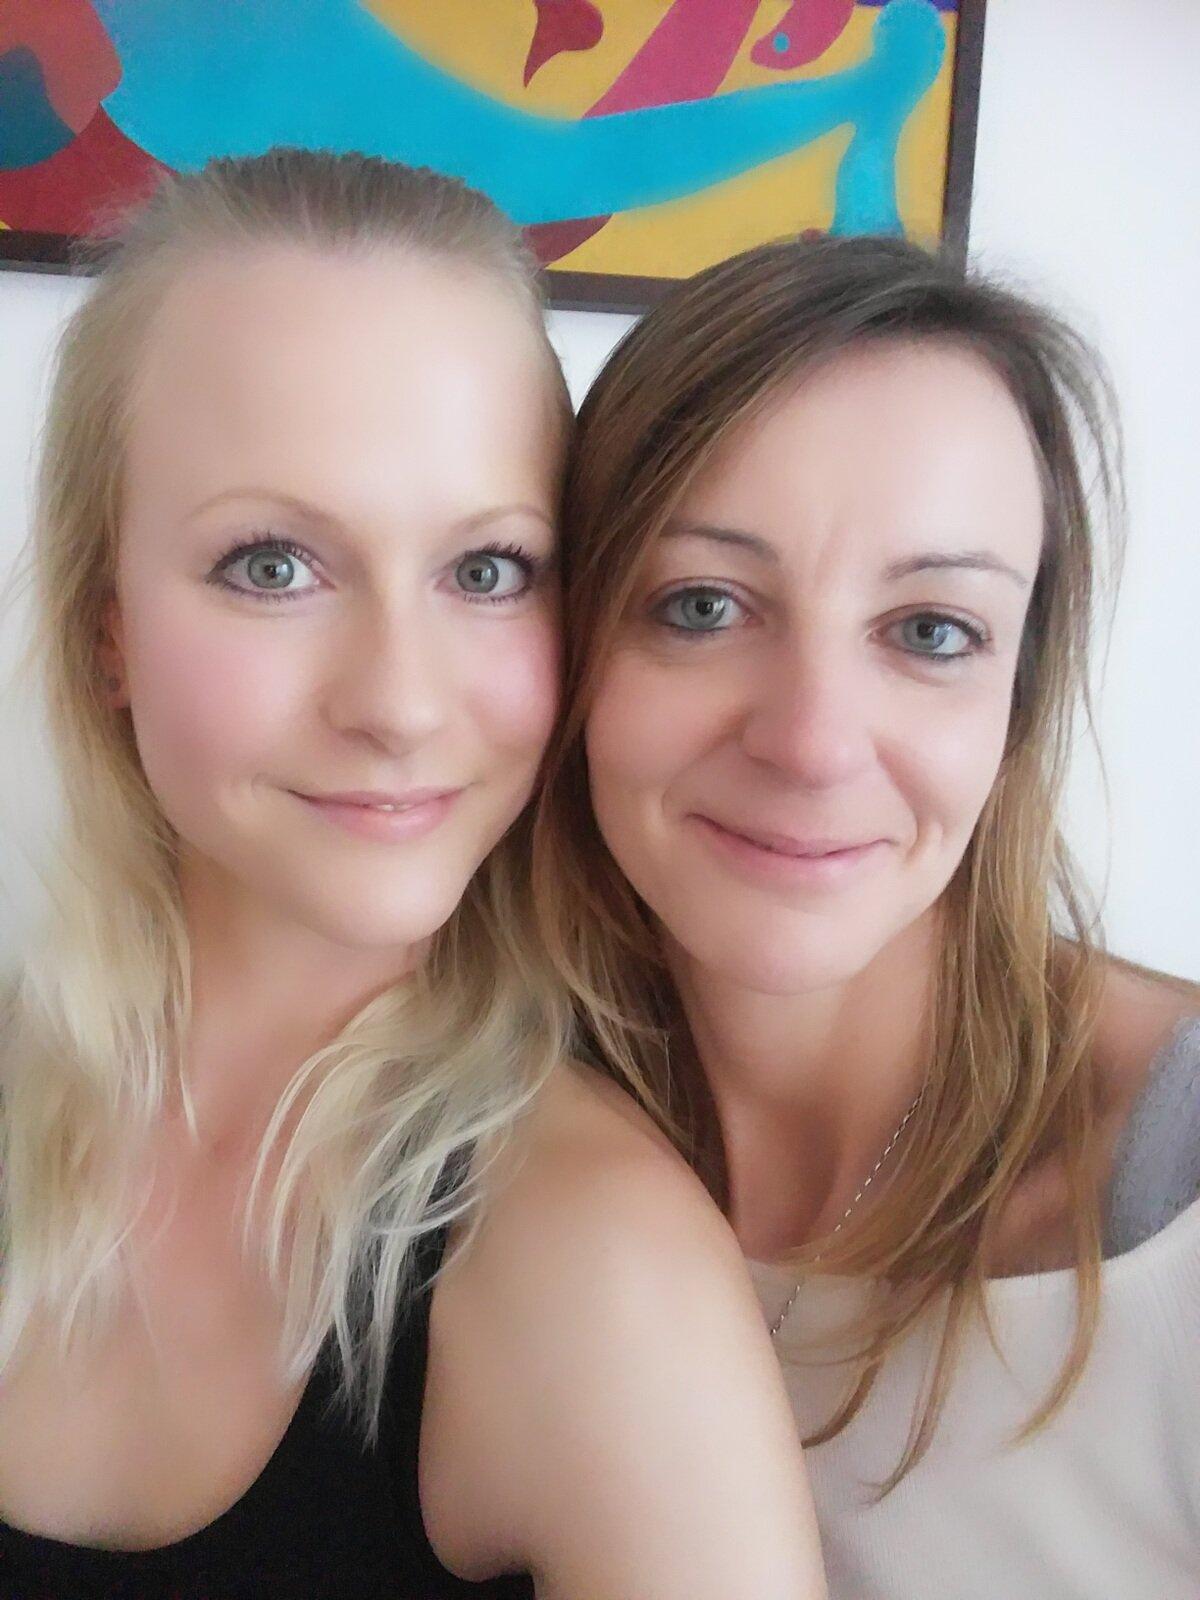 TW Pornstars - BlondeHexe. Twitter. Mit @LissLonglegs. 1